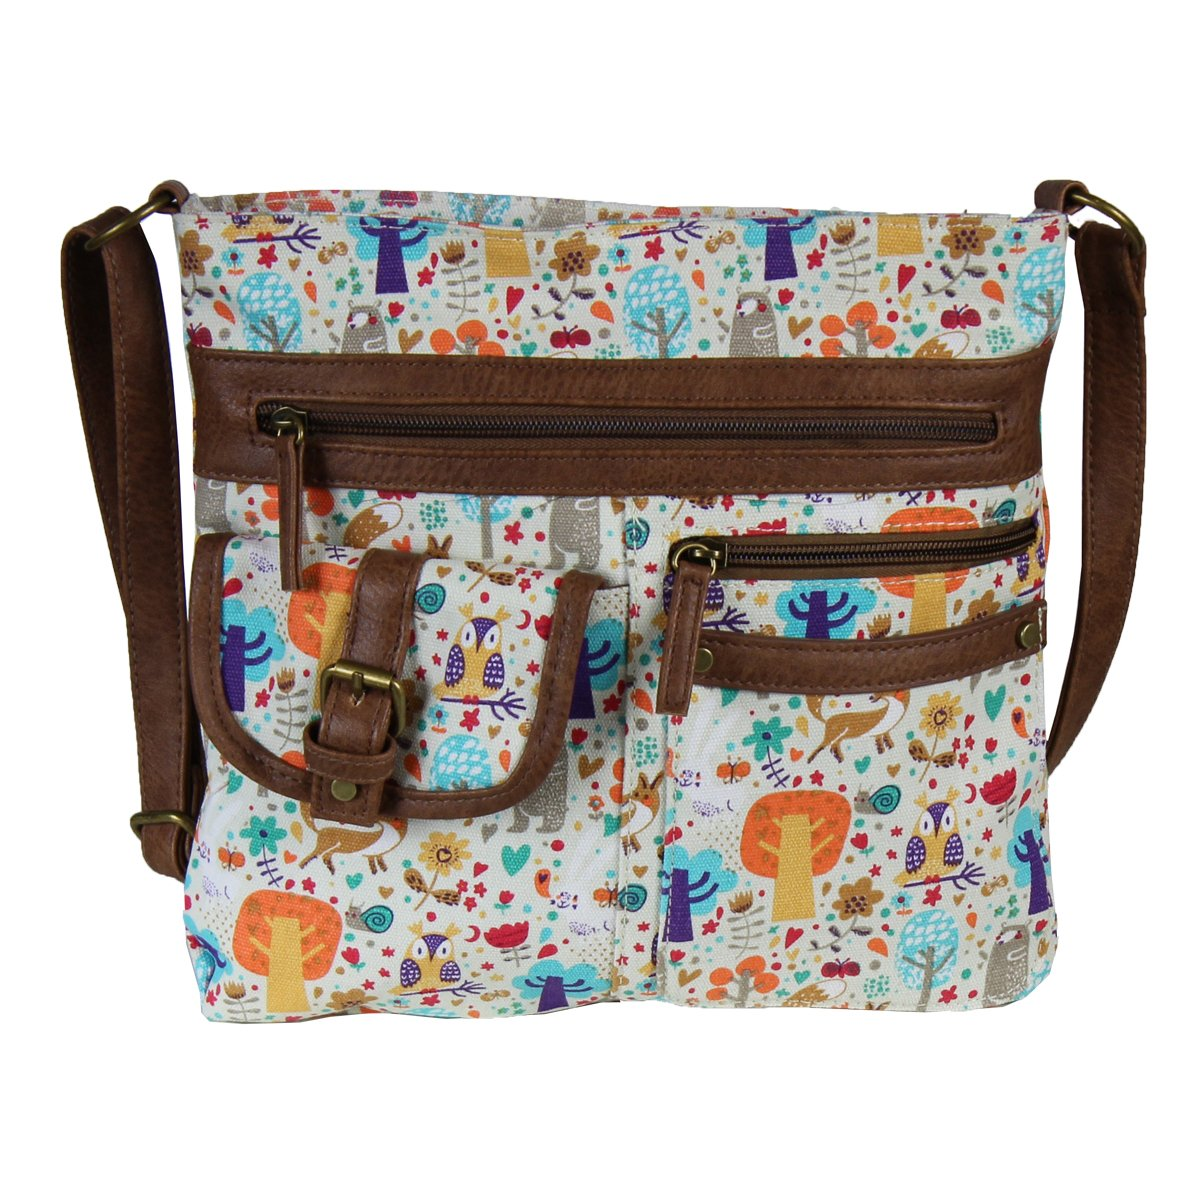 Whimsical Forest Crossbody Bag Organizer, Owl & Fox Handbag Purse, Cotton Canvas